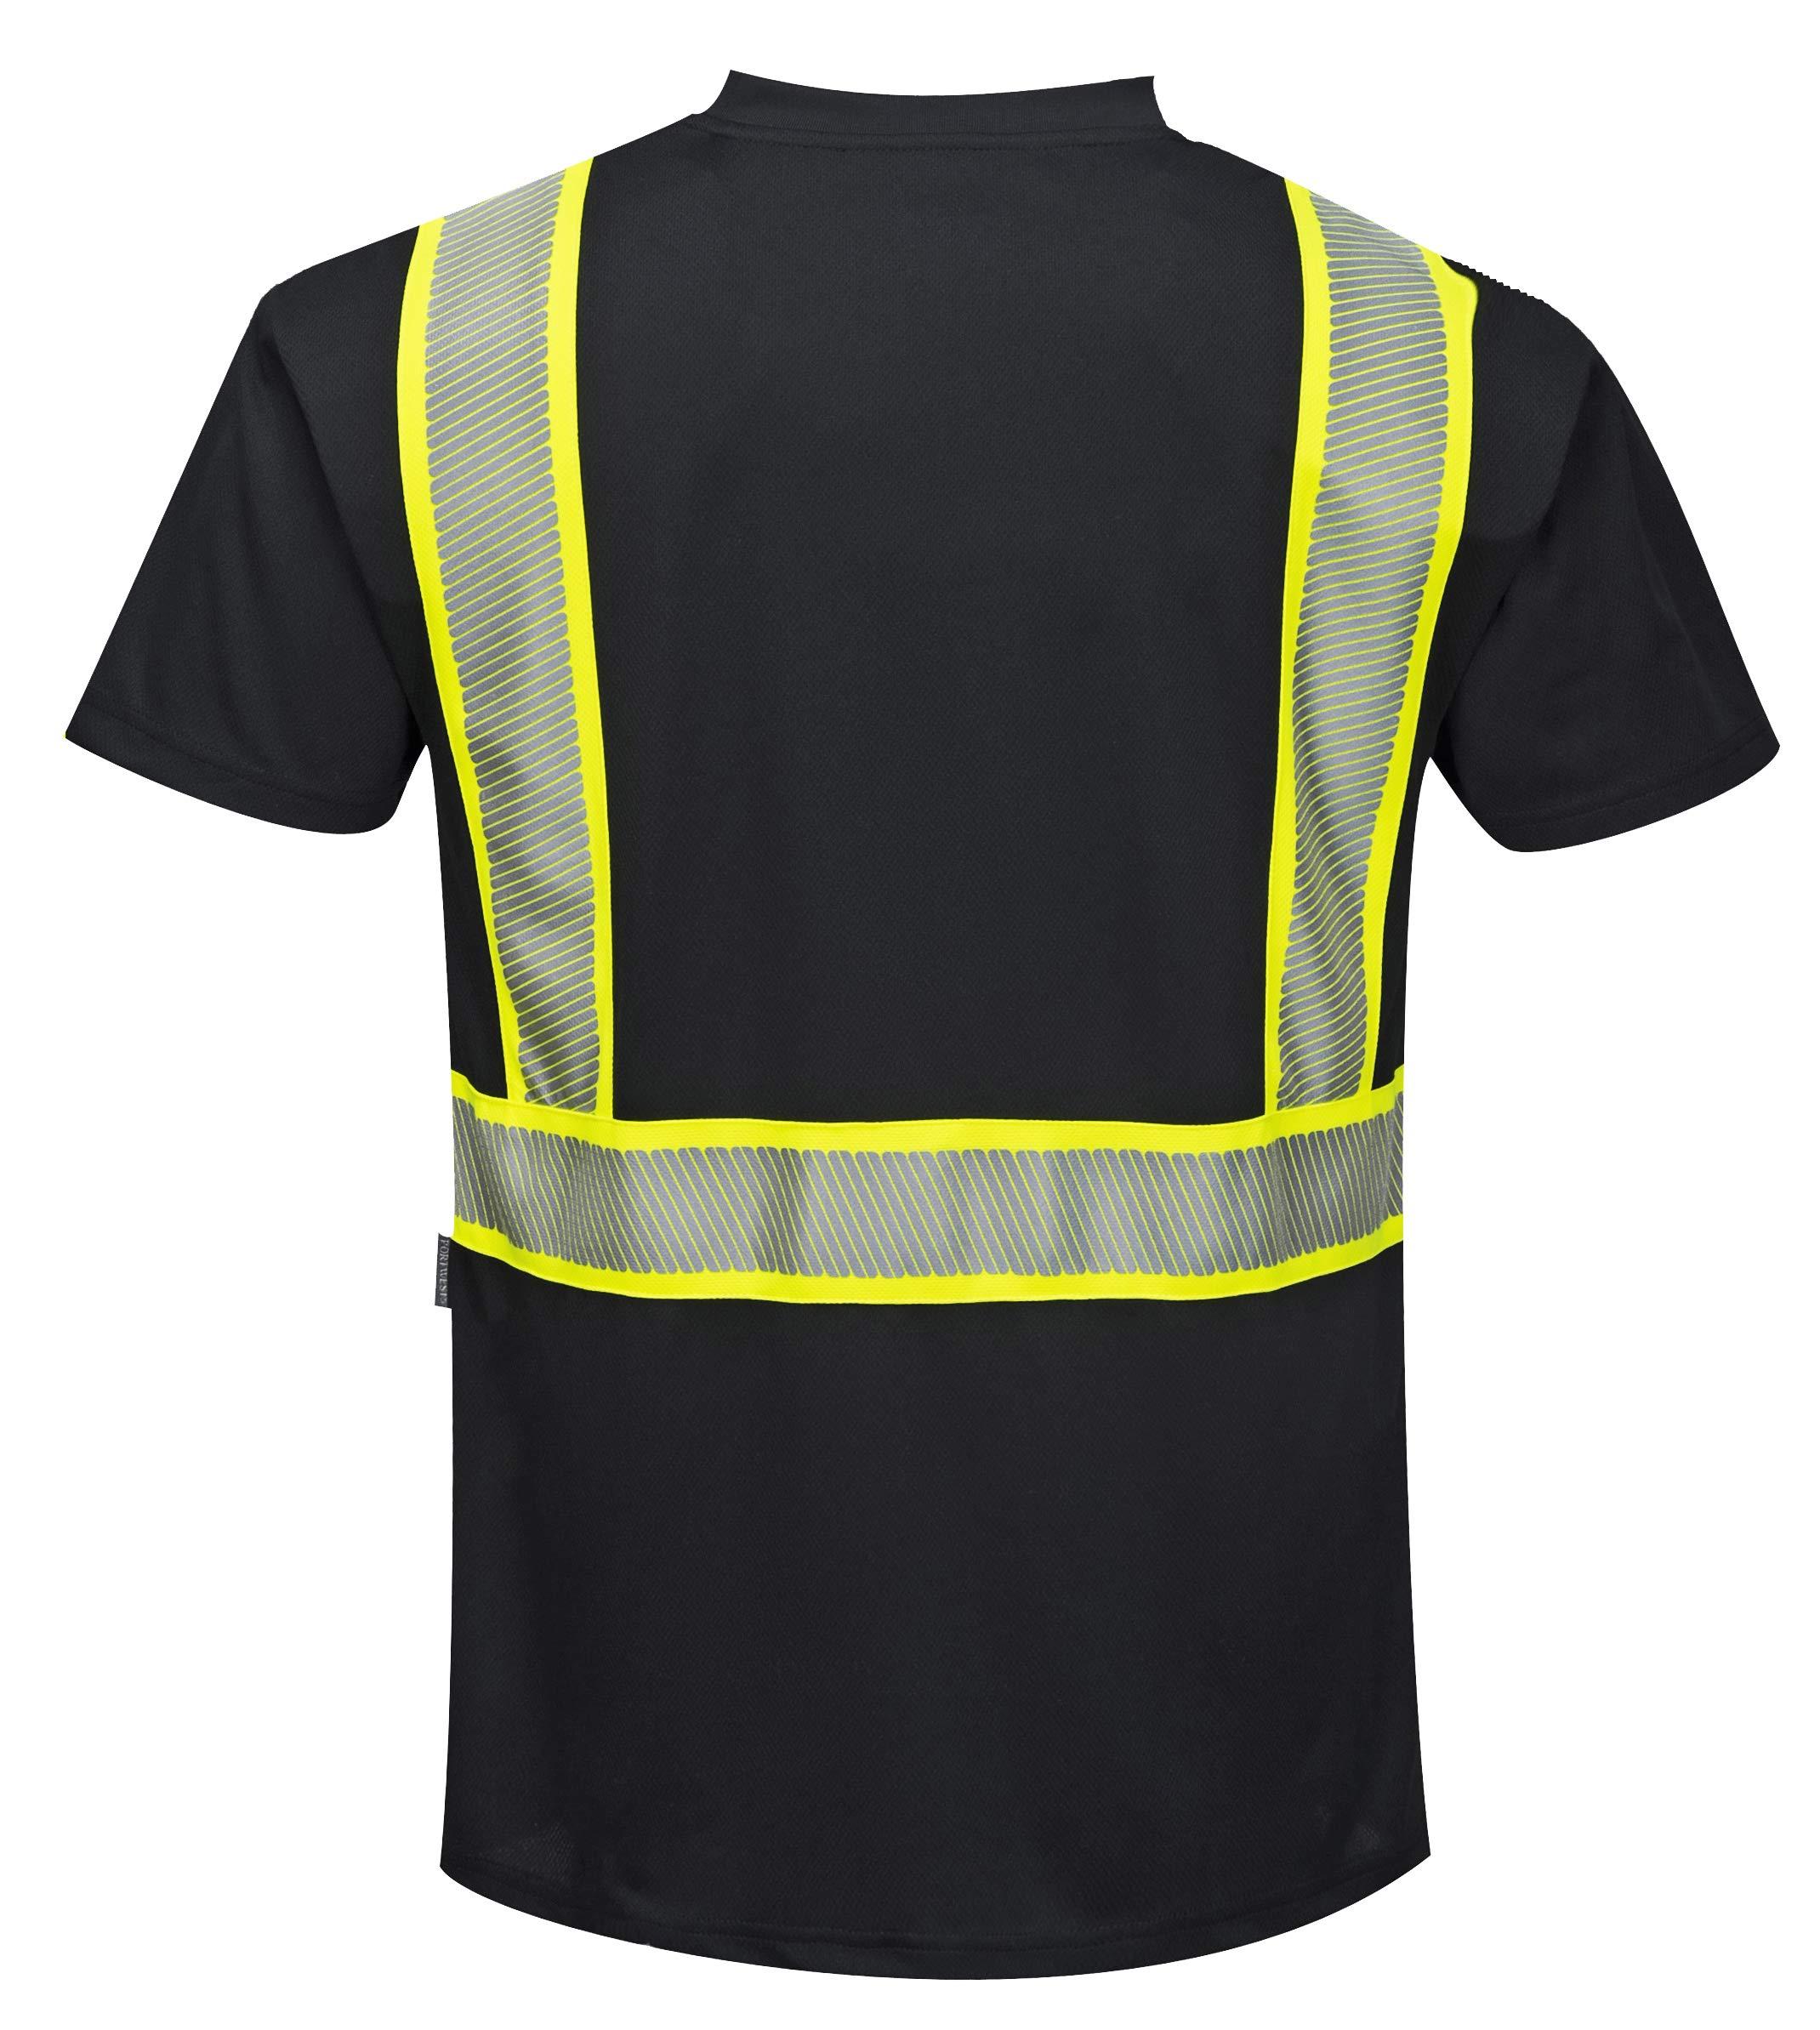 Portwest Austin Short-Sleeved T-Shirt Viz Visibility Reflective Safety Work Wear Top, 5XL Black by Portwest (Image #1)